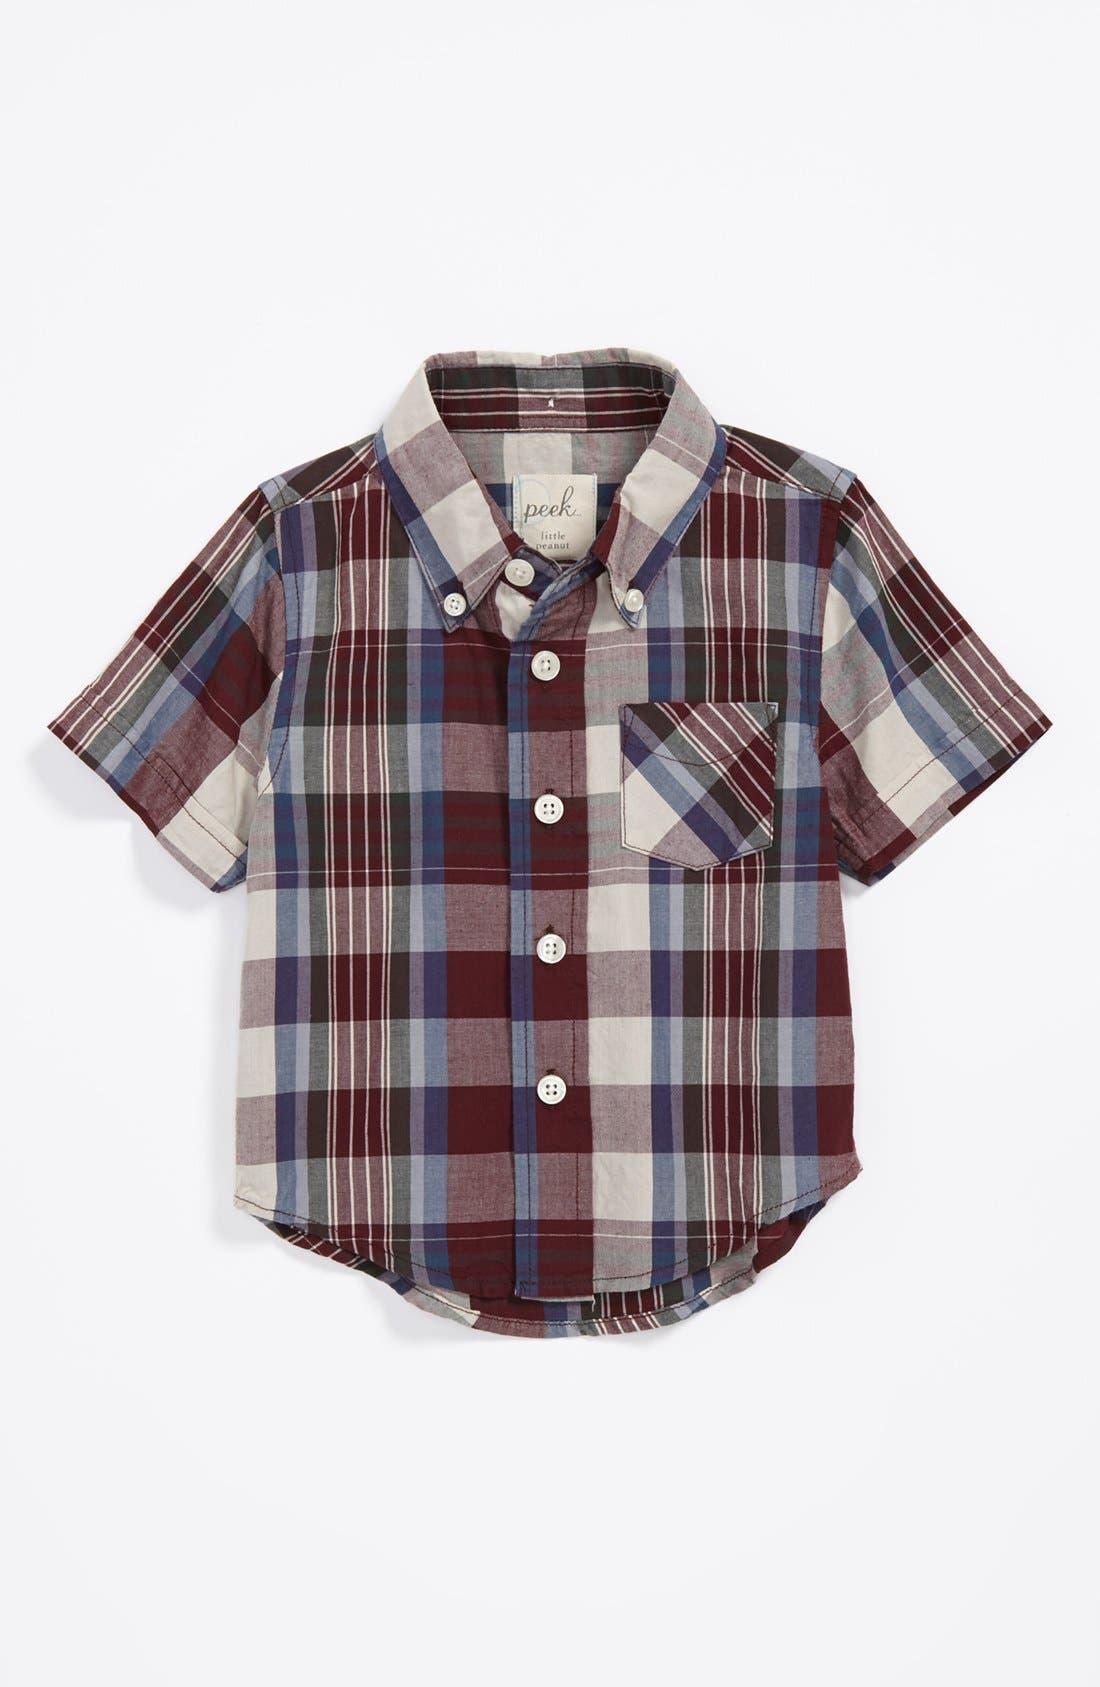 Alternate Image 1 Selected - Peek 'Oliver' Plaid Shirt (Baby Boys)